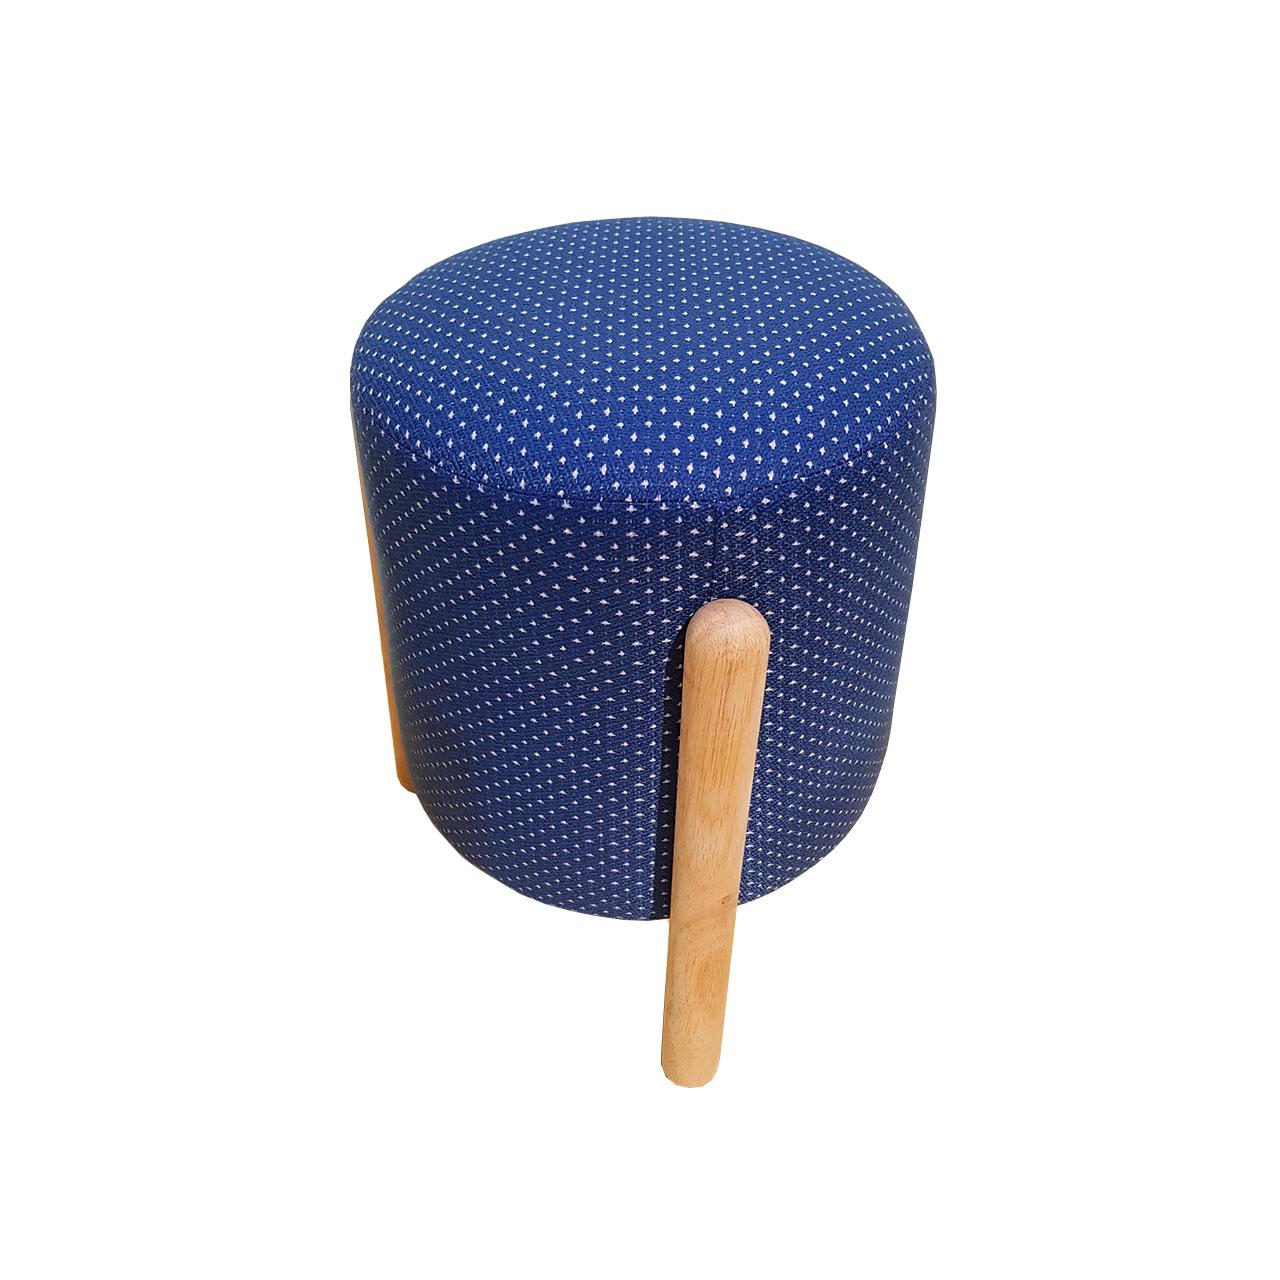 stool chair ph ergonomic là gì oberon furniture store manila philippines urban